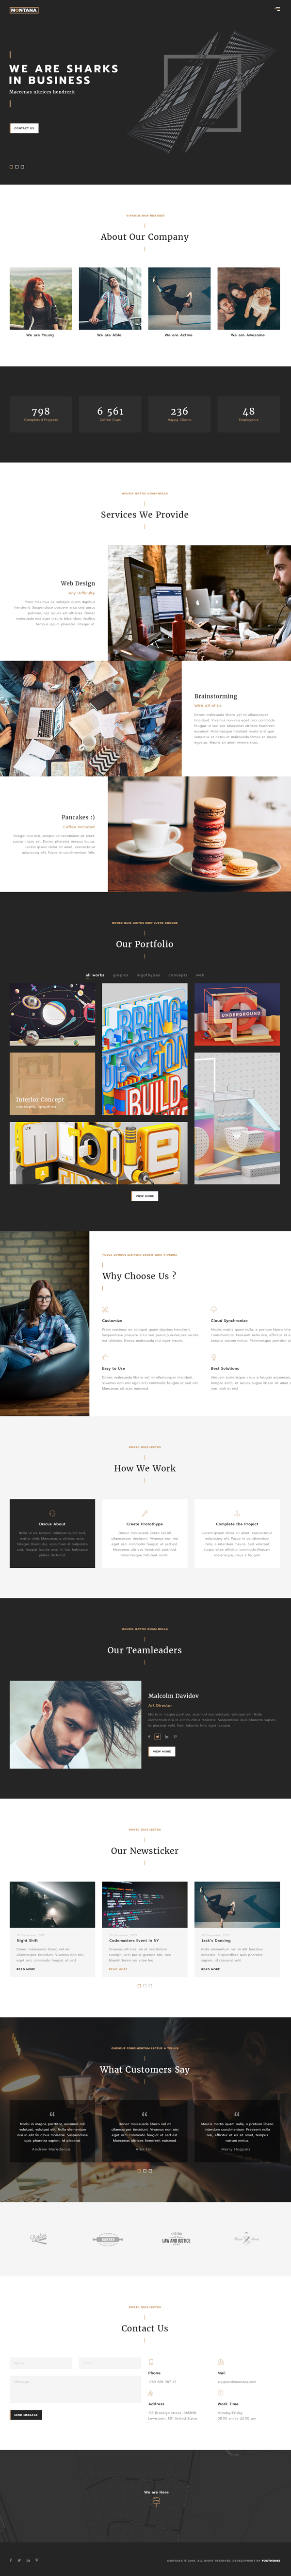 Fresh multipurpose Responsive HTML5 Templates & Themes   Design   Graphic…